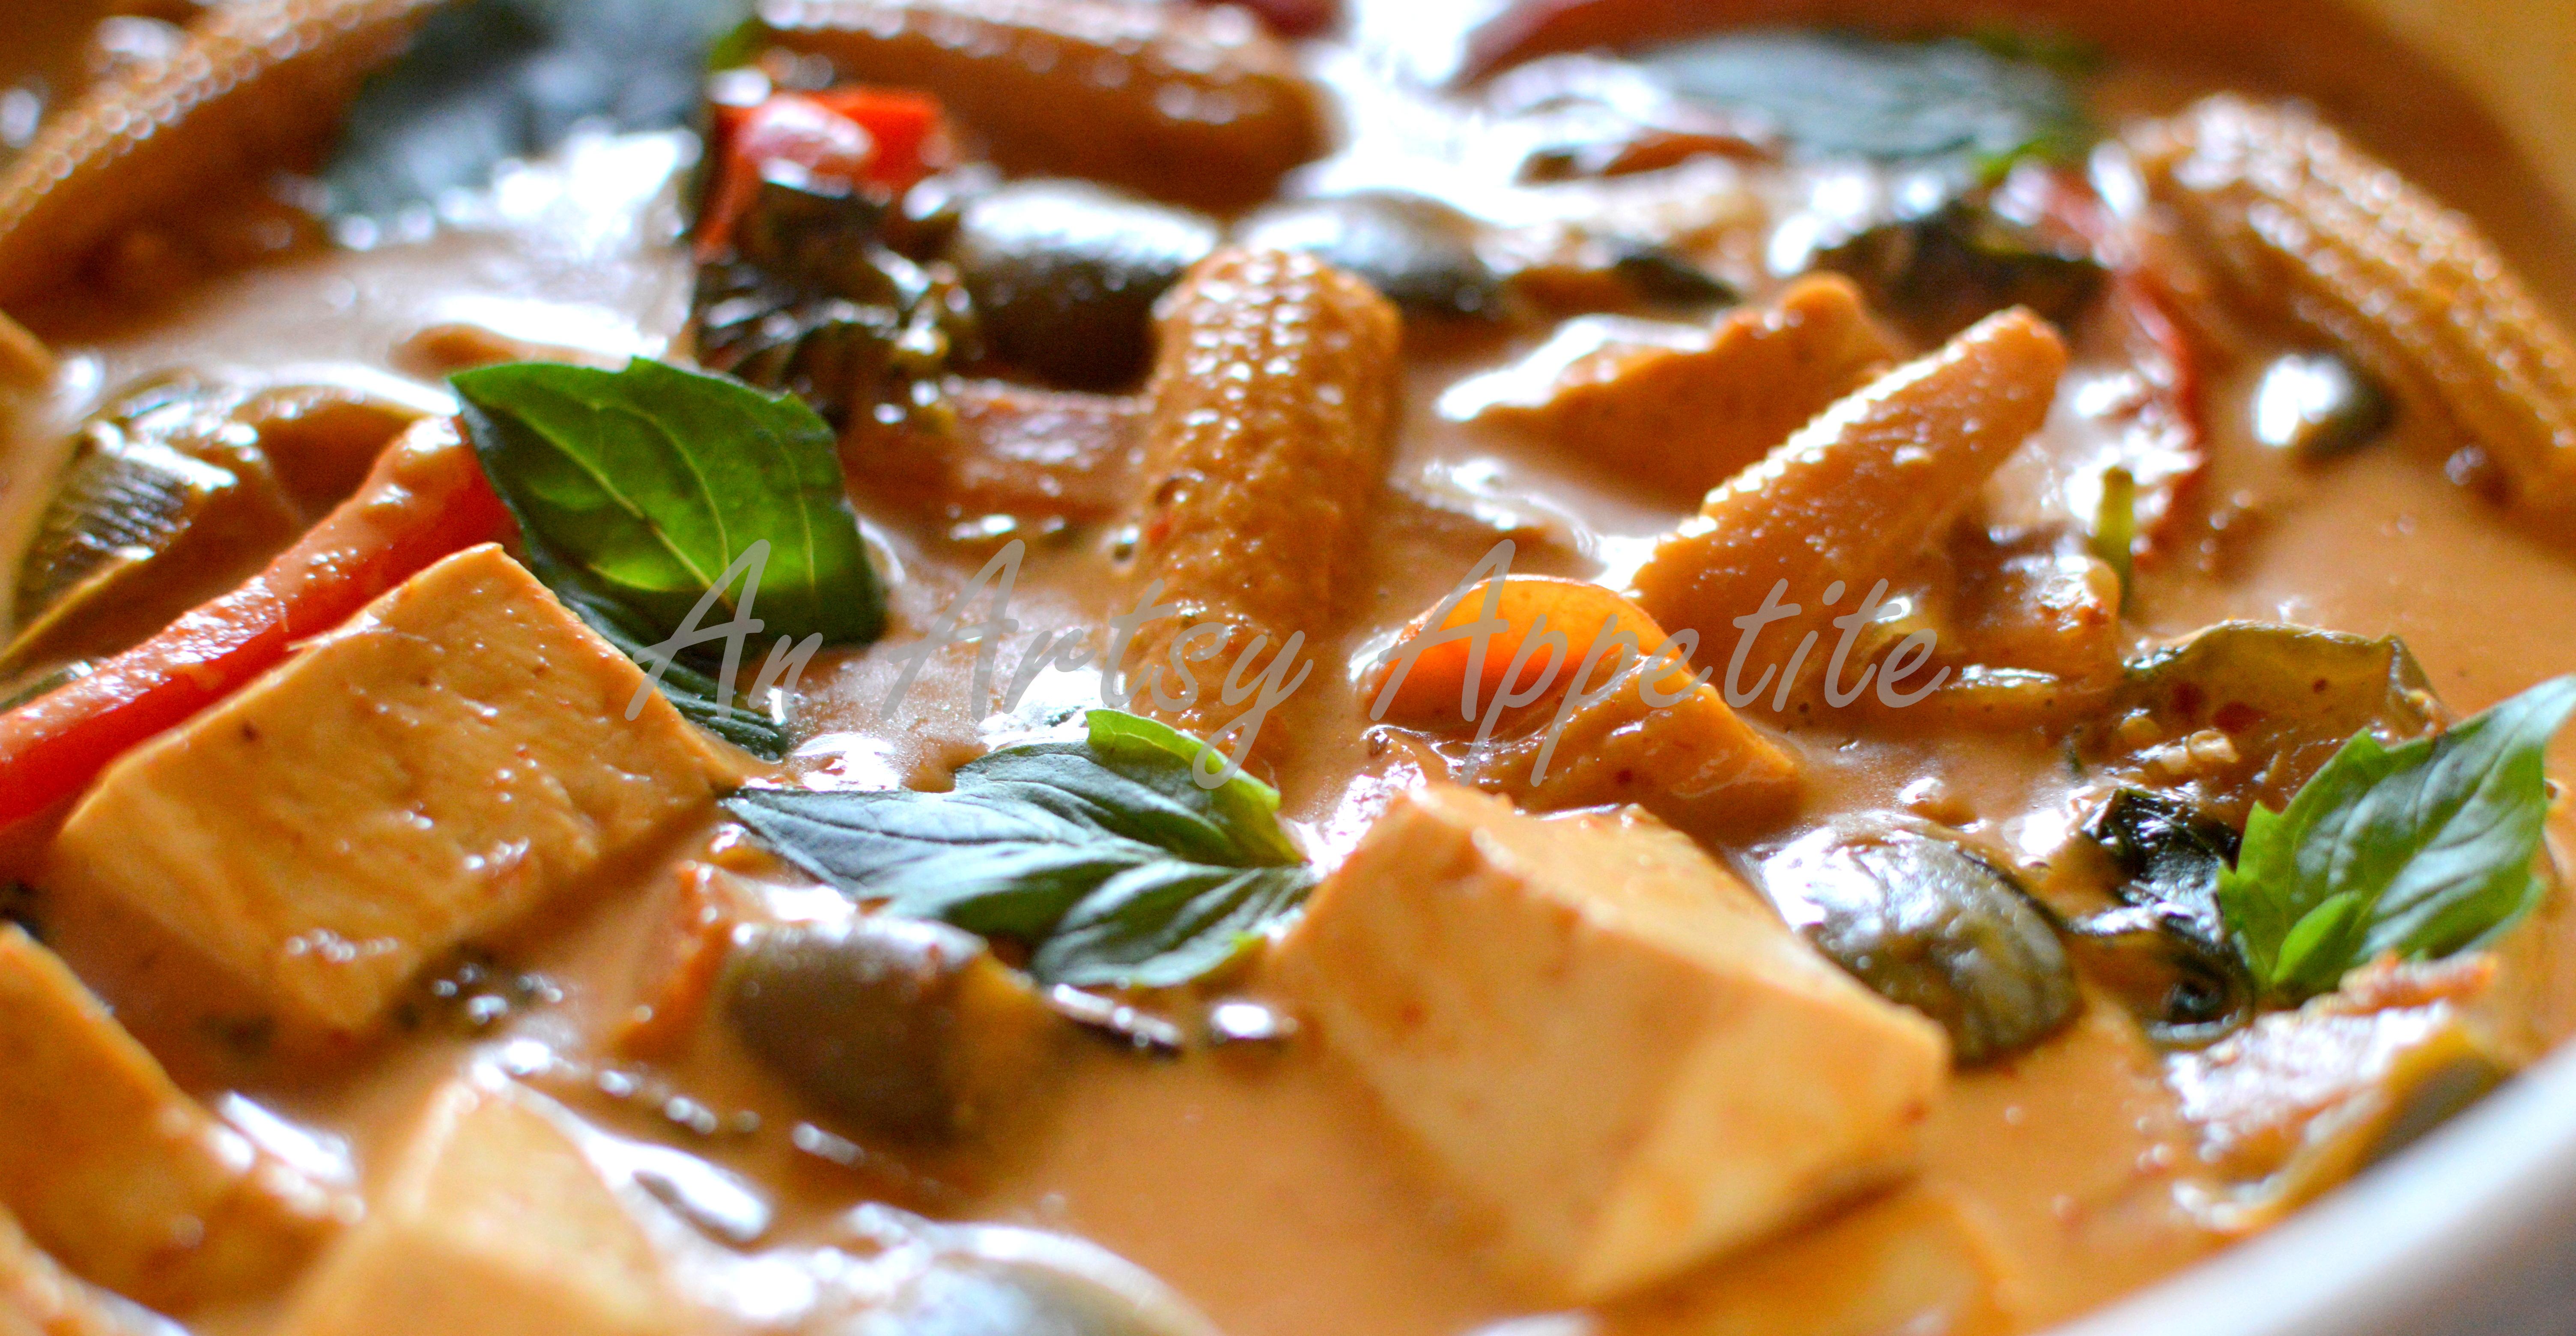 Thai red curry recipe vegetarian an artsy appetite thai red curry vegetarian recipe forumfinder Choice Image